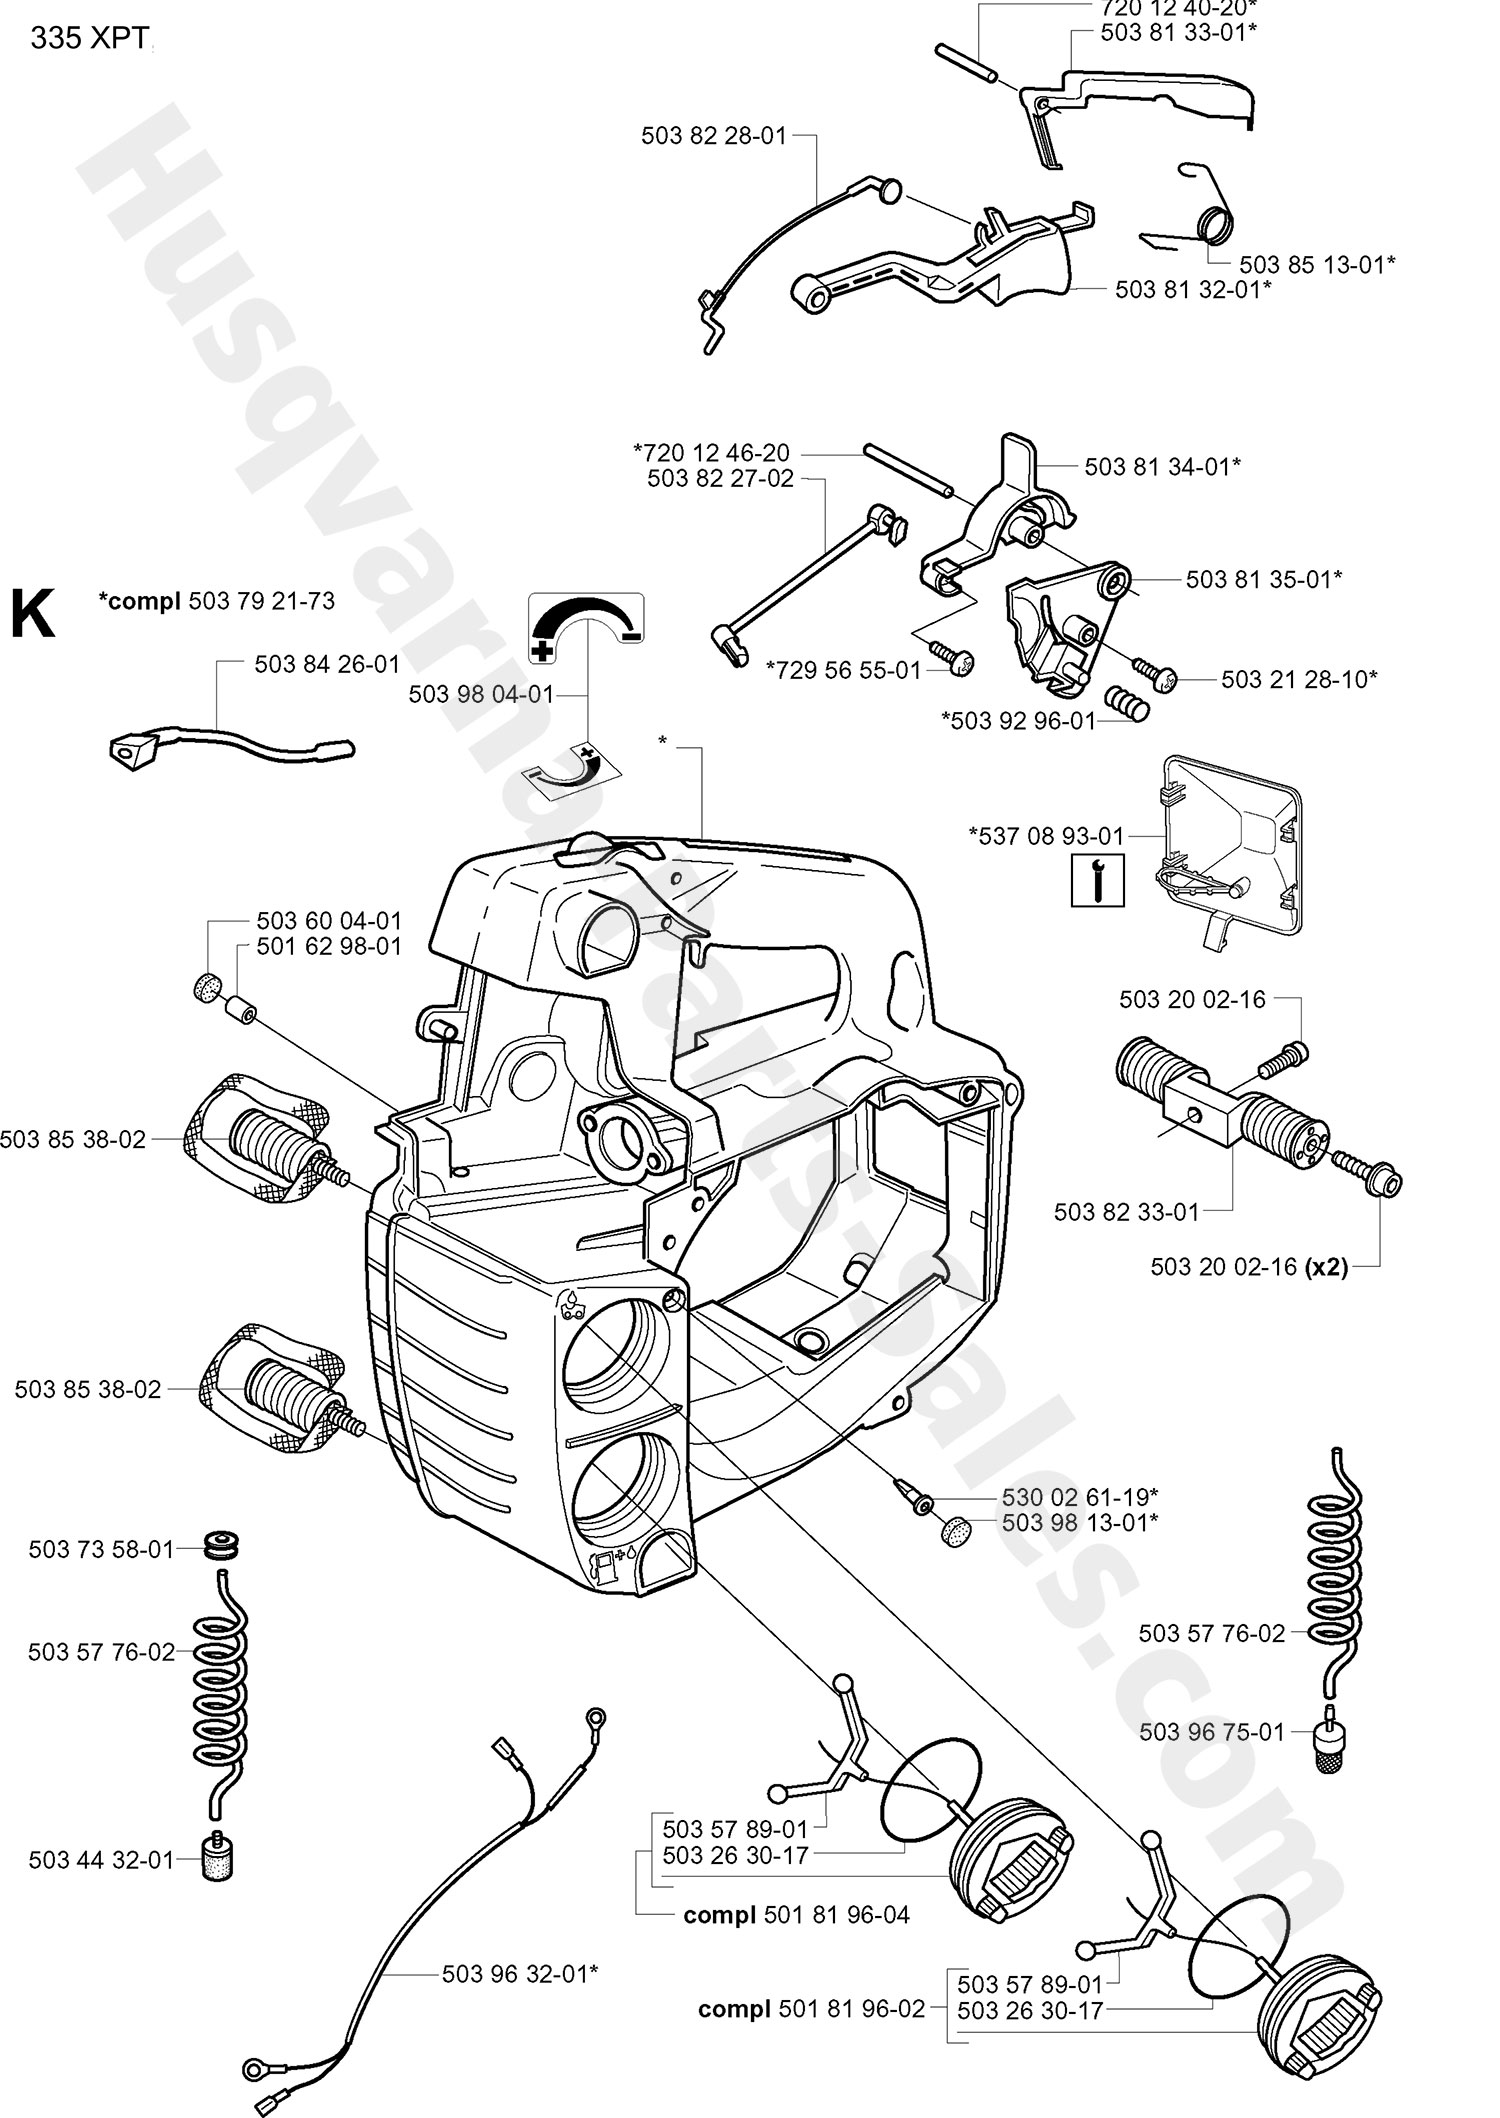 335xpt Husqvarna Professional Chain Saw Fuel Tank Amp Handle